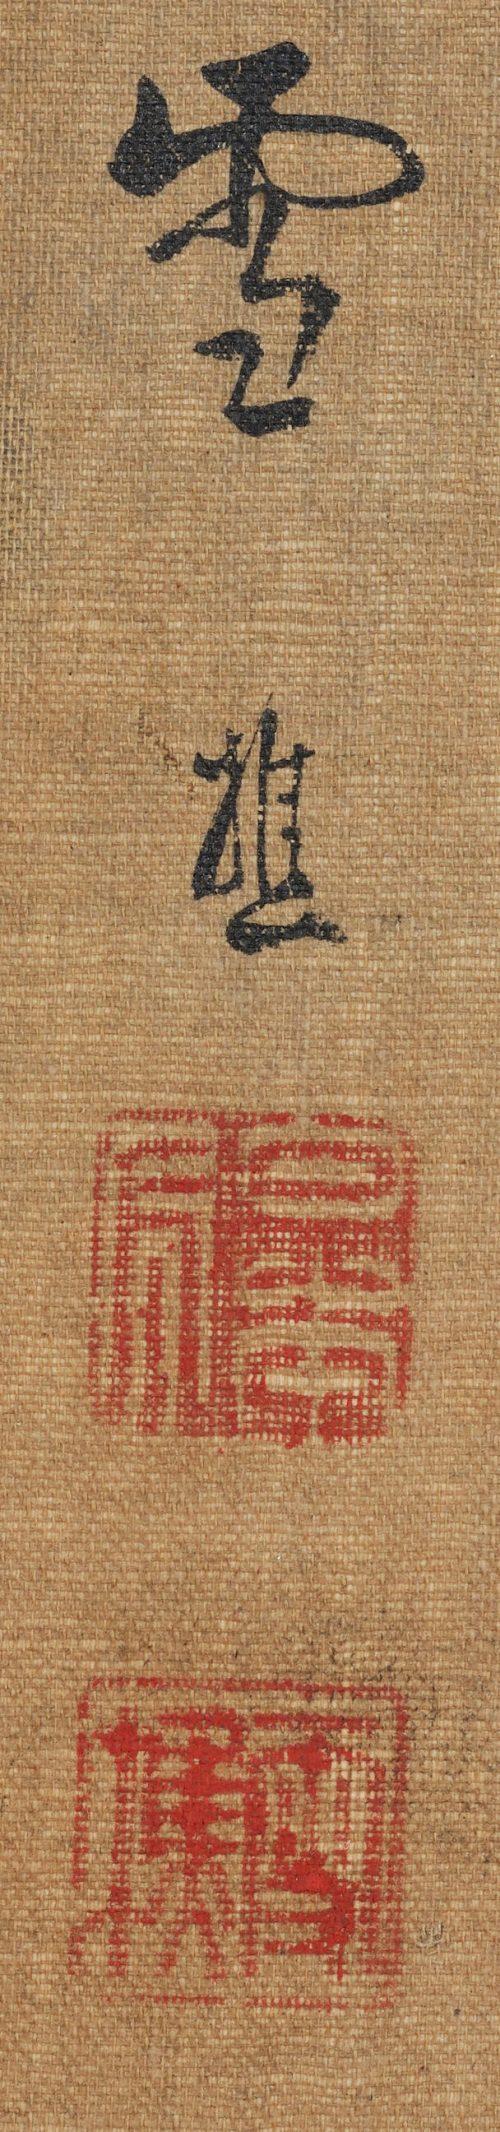 sugitani sessho (1827-1895). nachi falls. japanese landscape scroll painting. signature and seal.